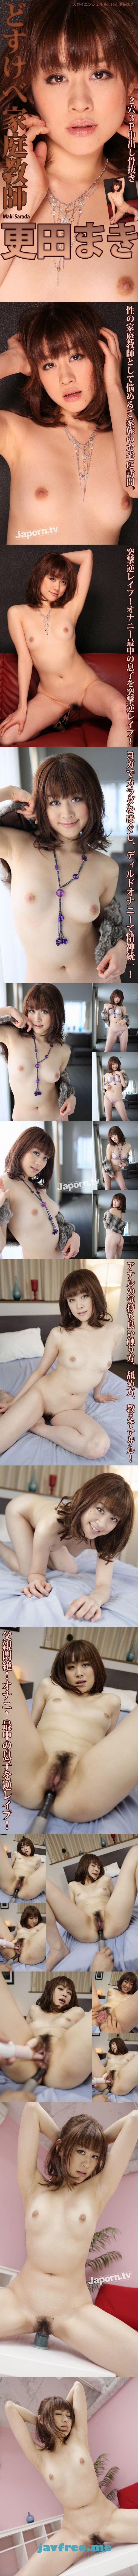 [SKY 257] スカイエンジェル Vol.153 : 更田まき 更田まき SKY Maki Sarada